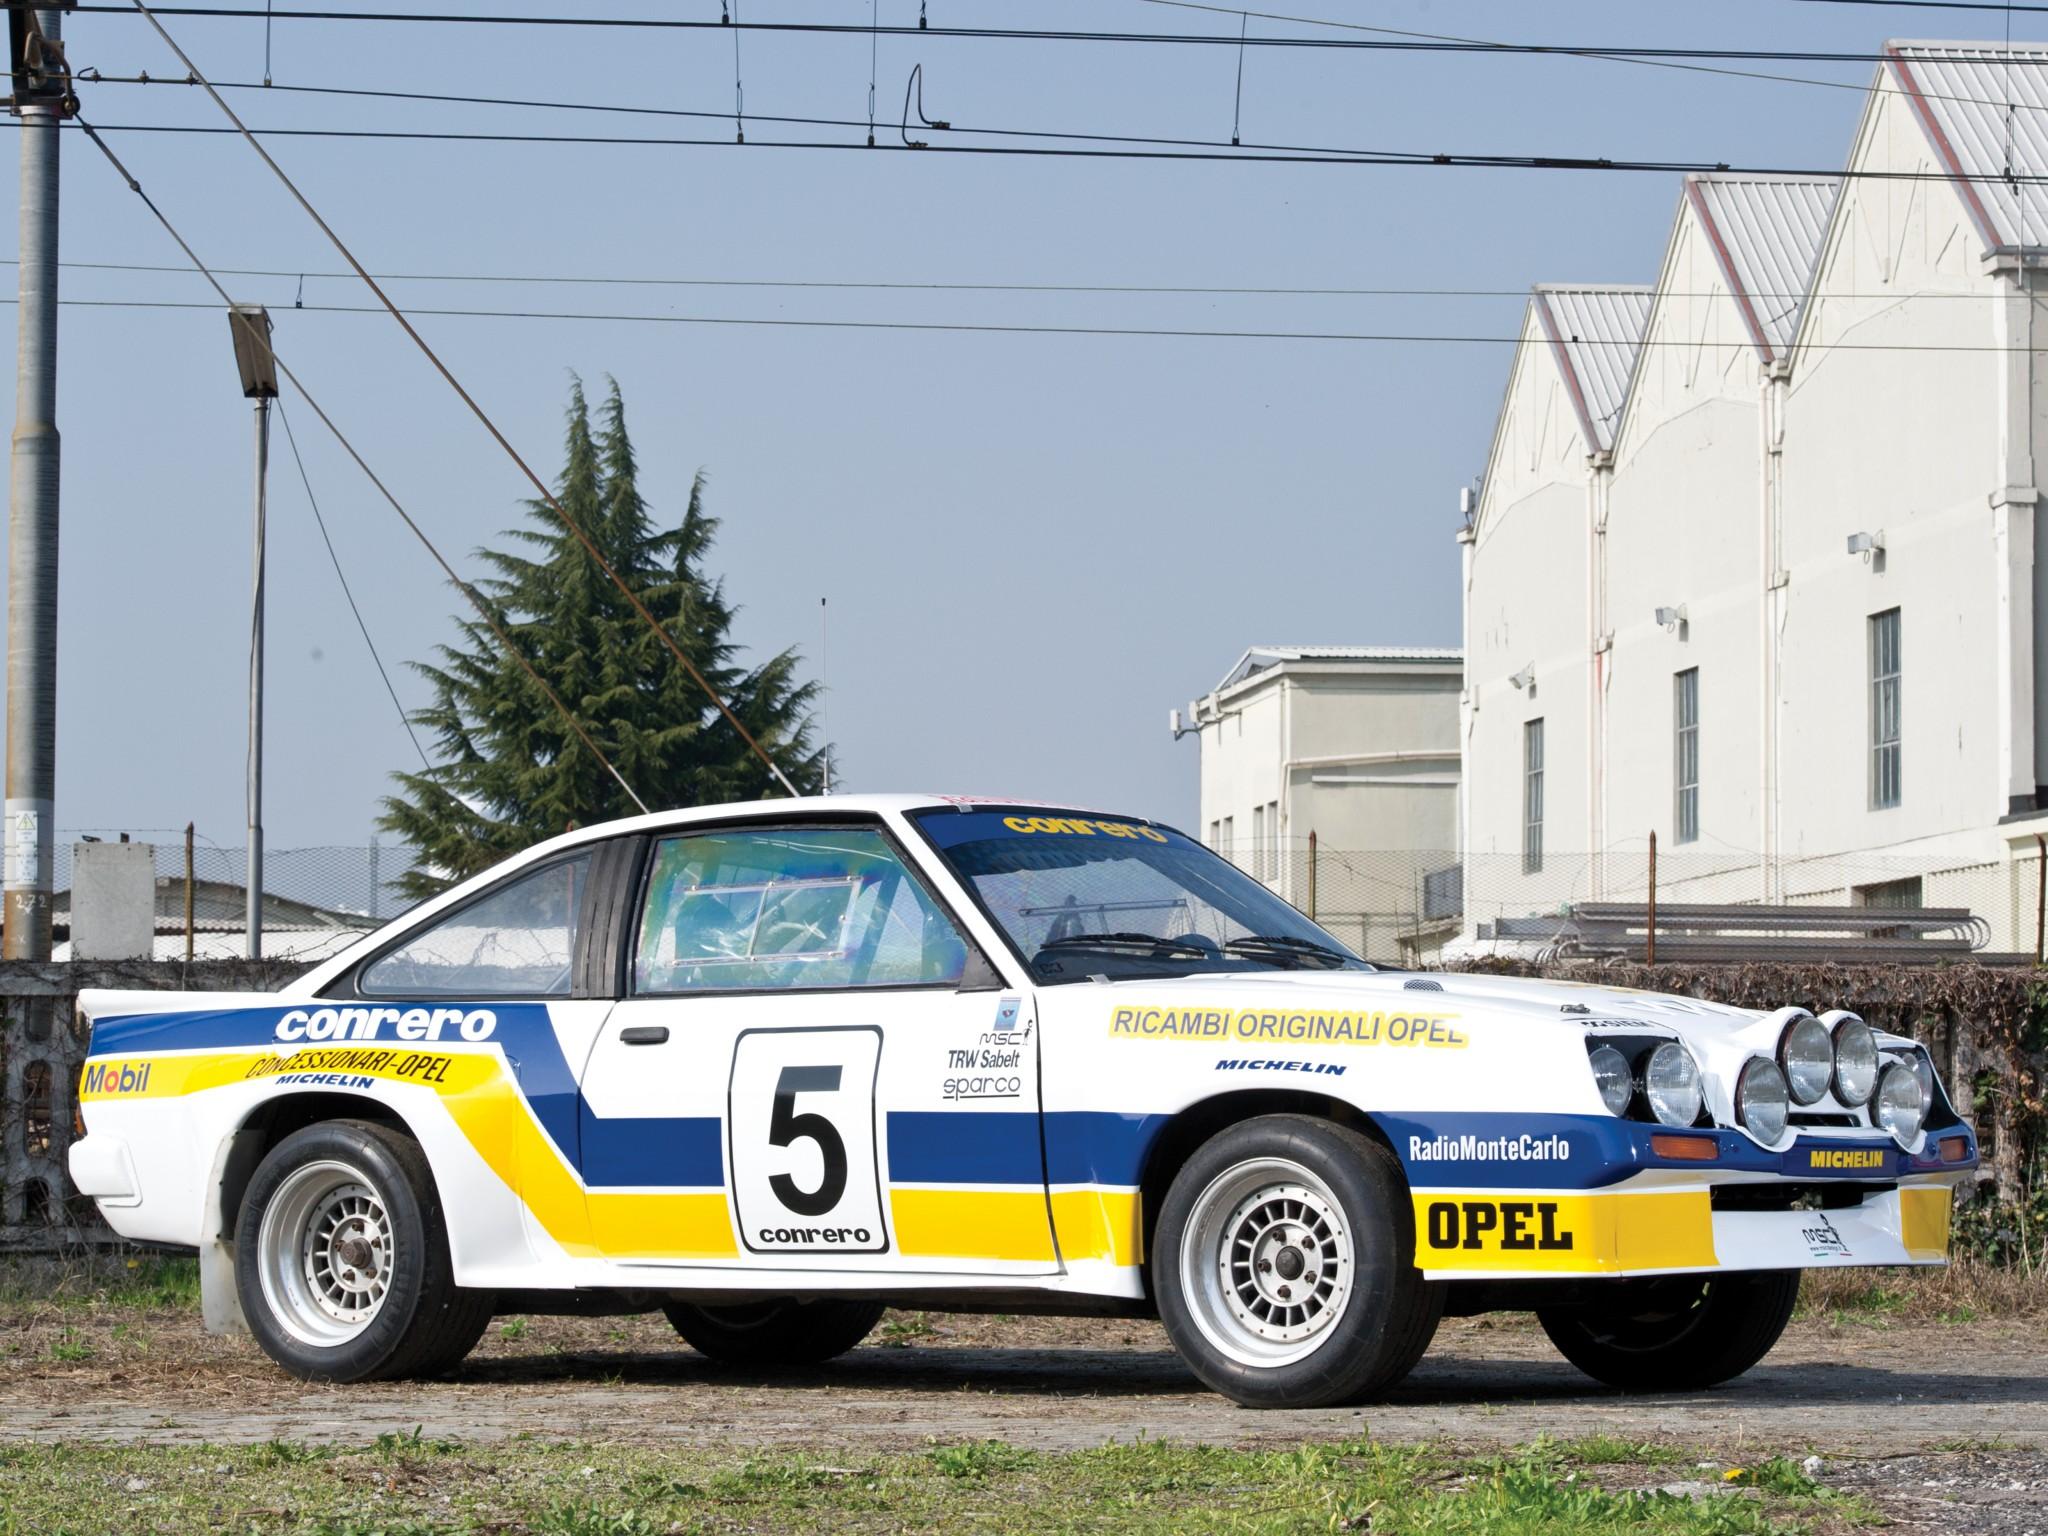 1981 Opel Manta 400 Group B Rally race racing wallpaper background 2048x1536